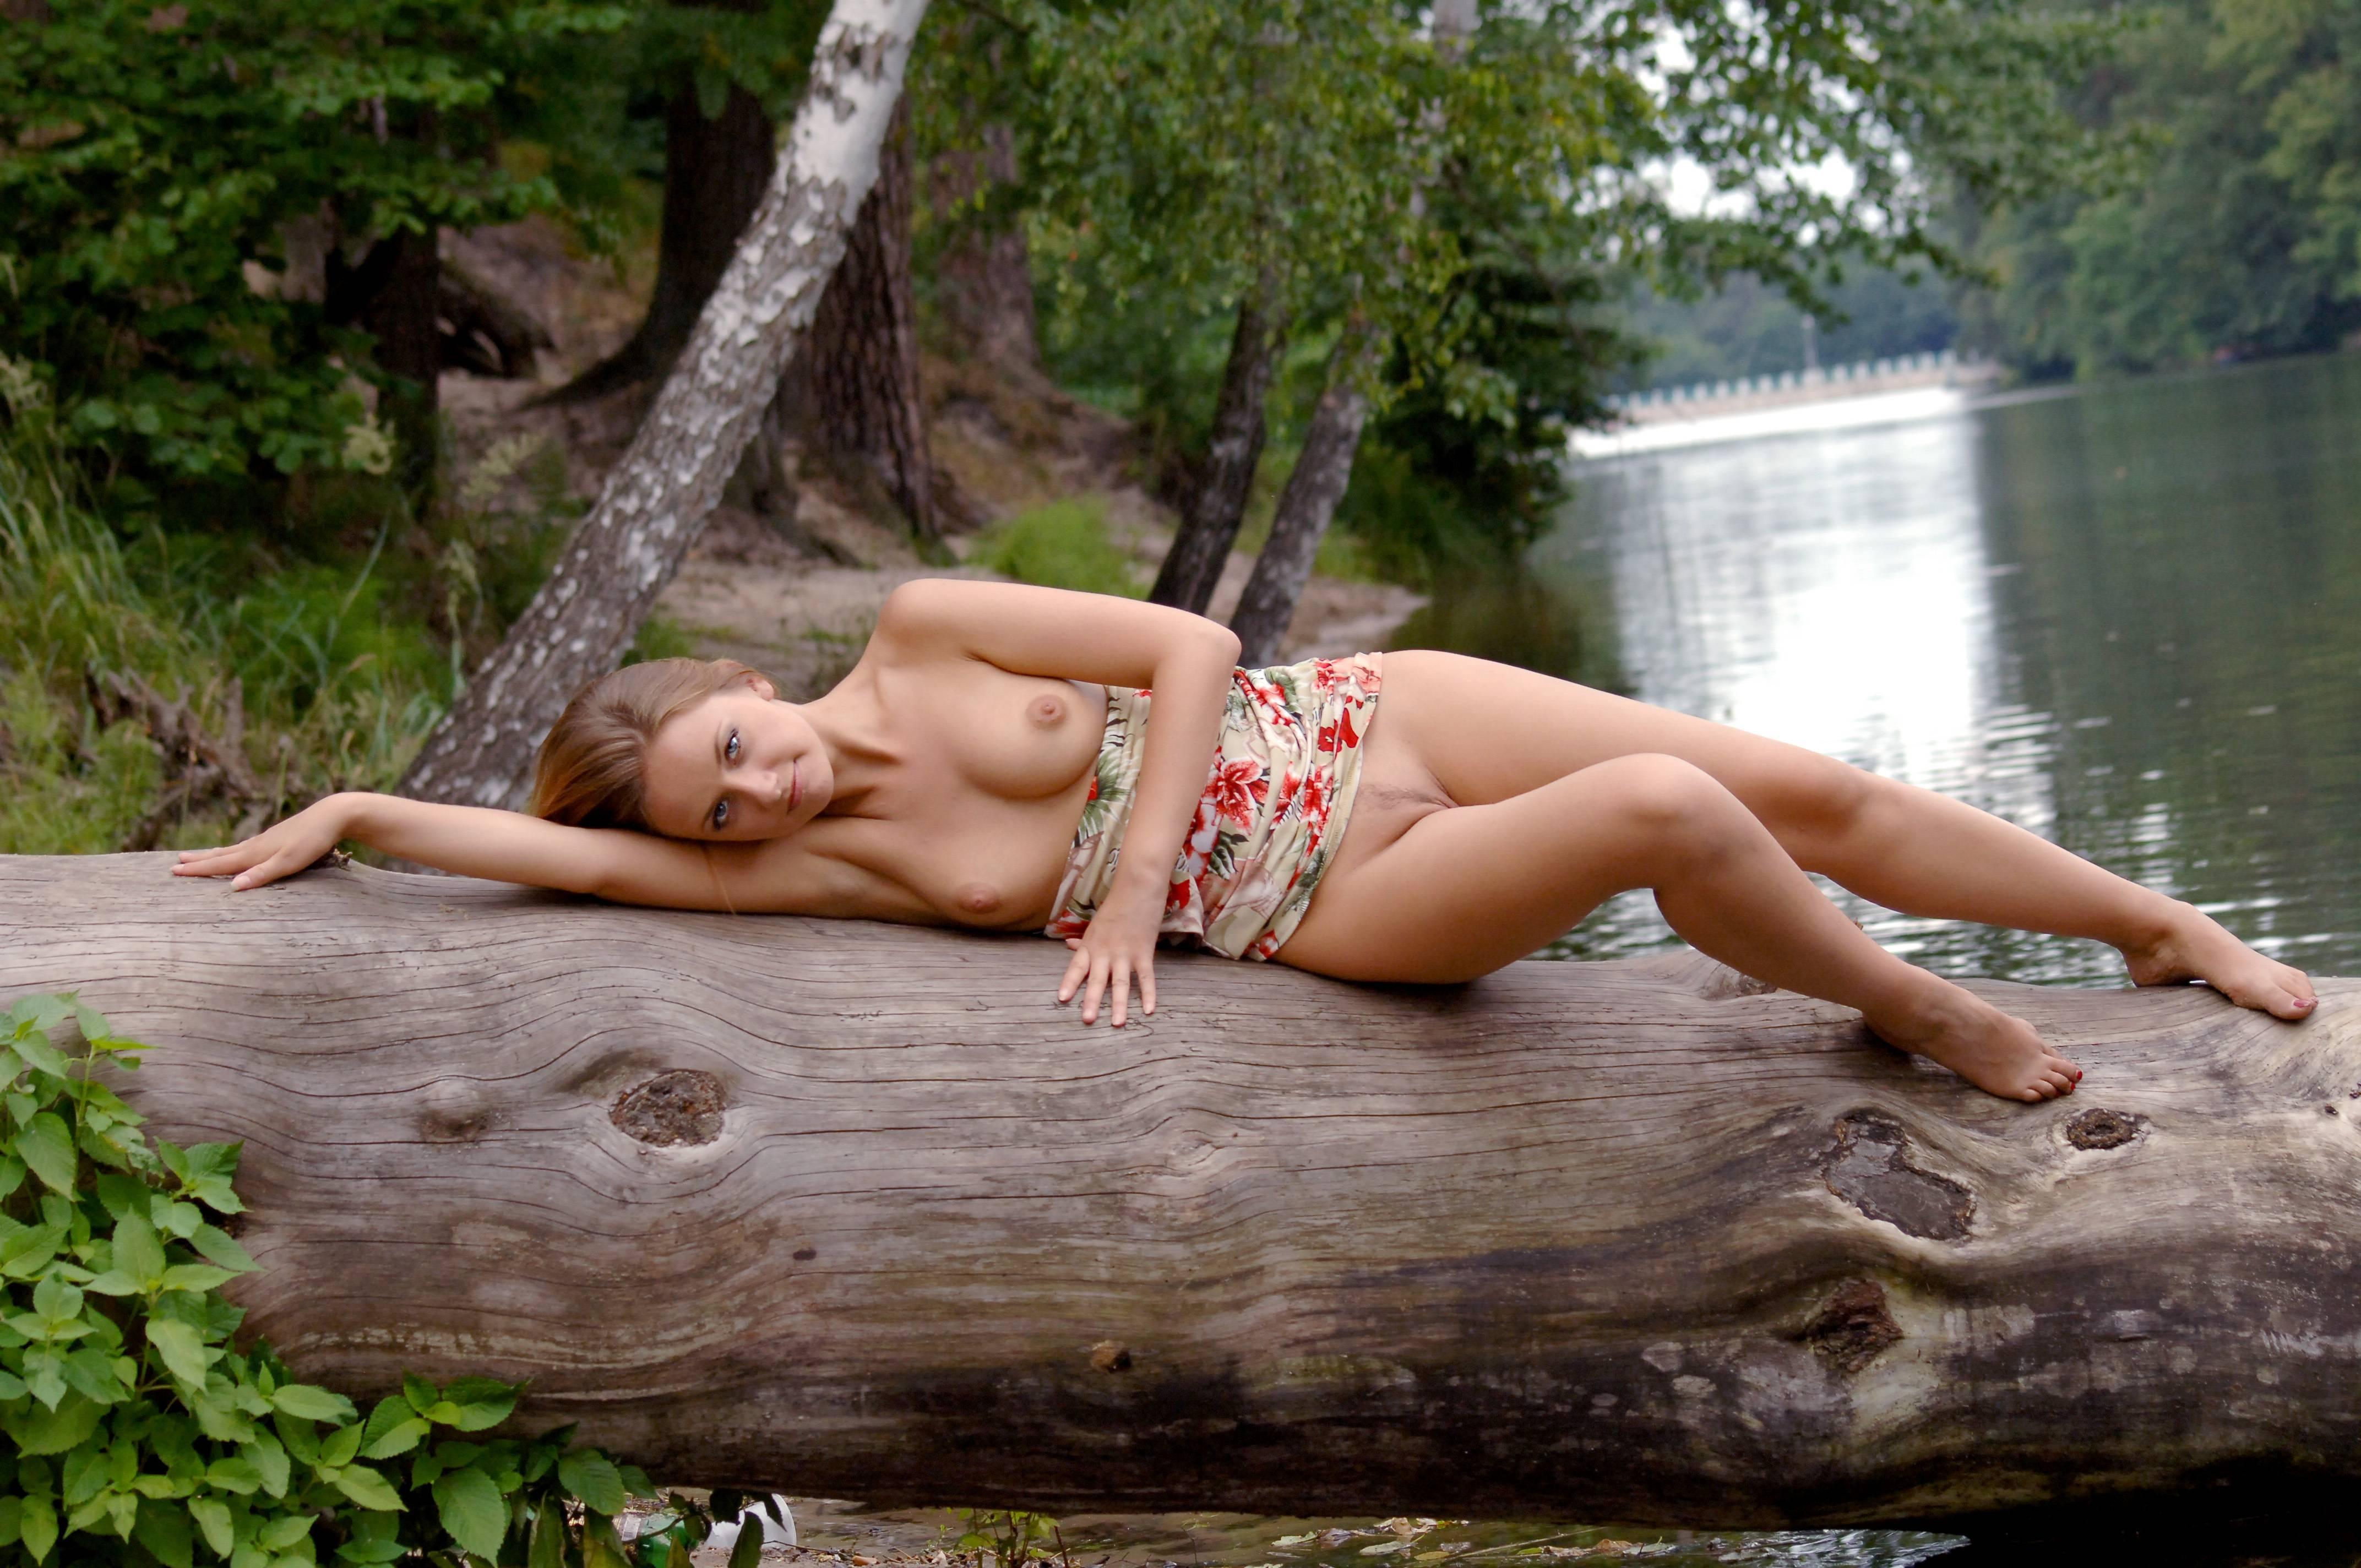 Реальная эротика на природе фото 5